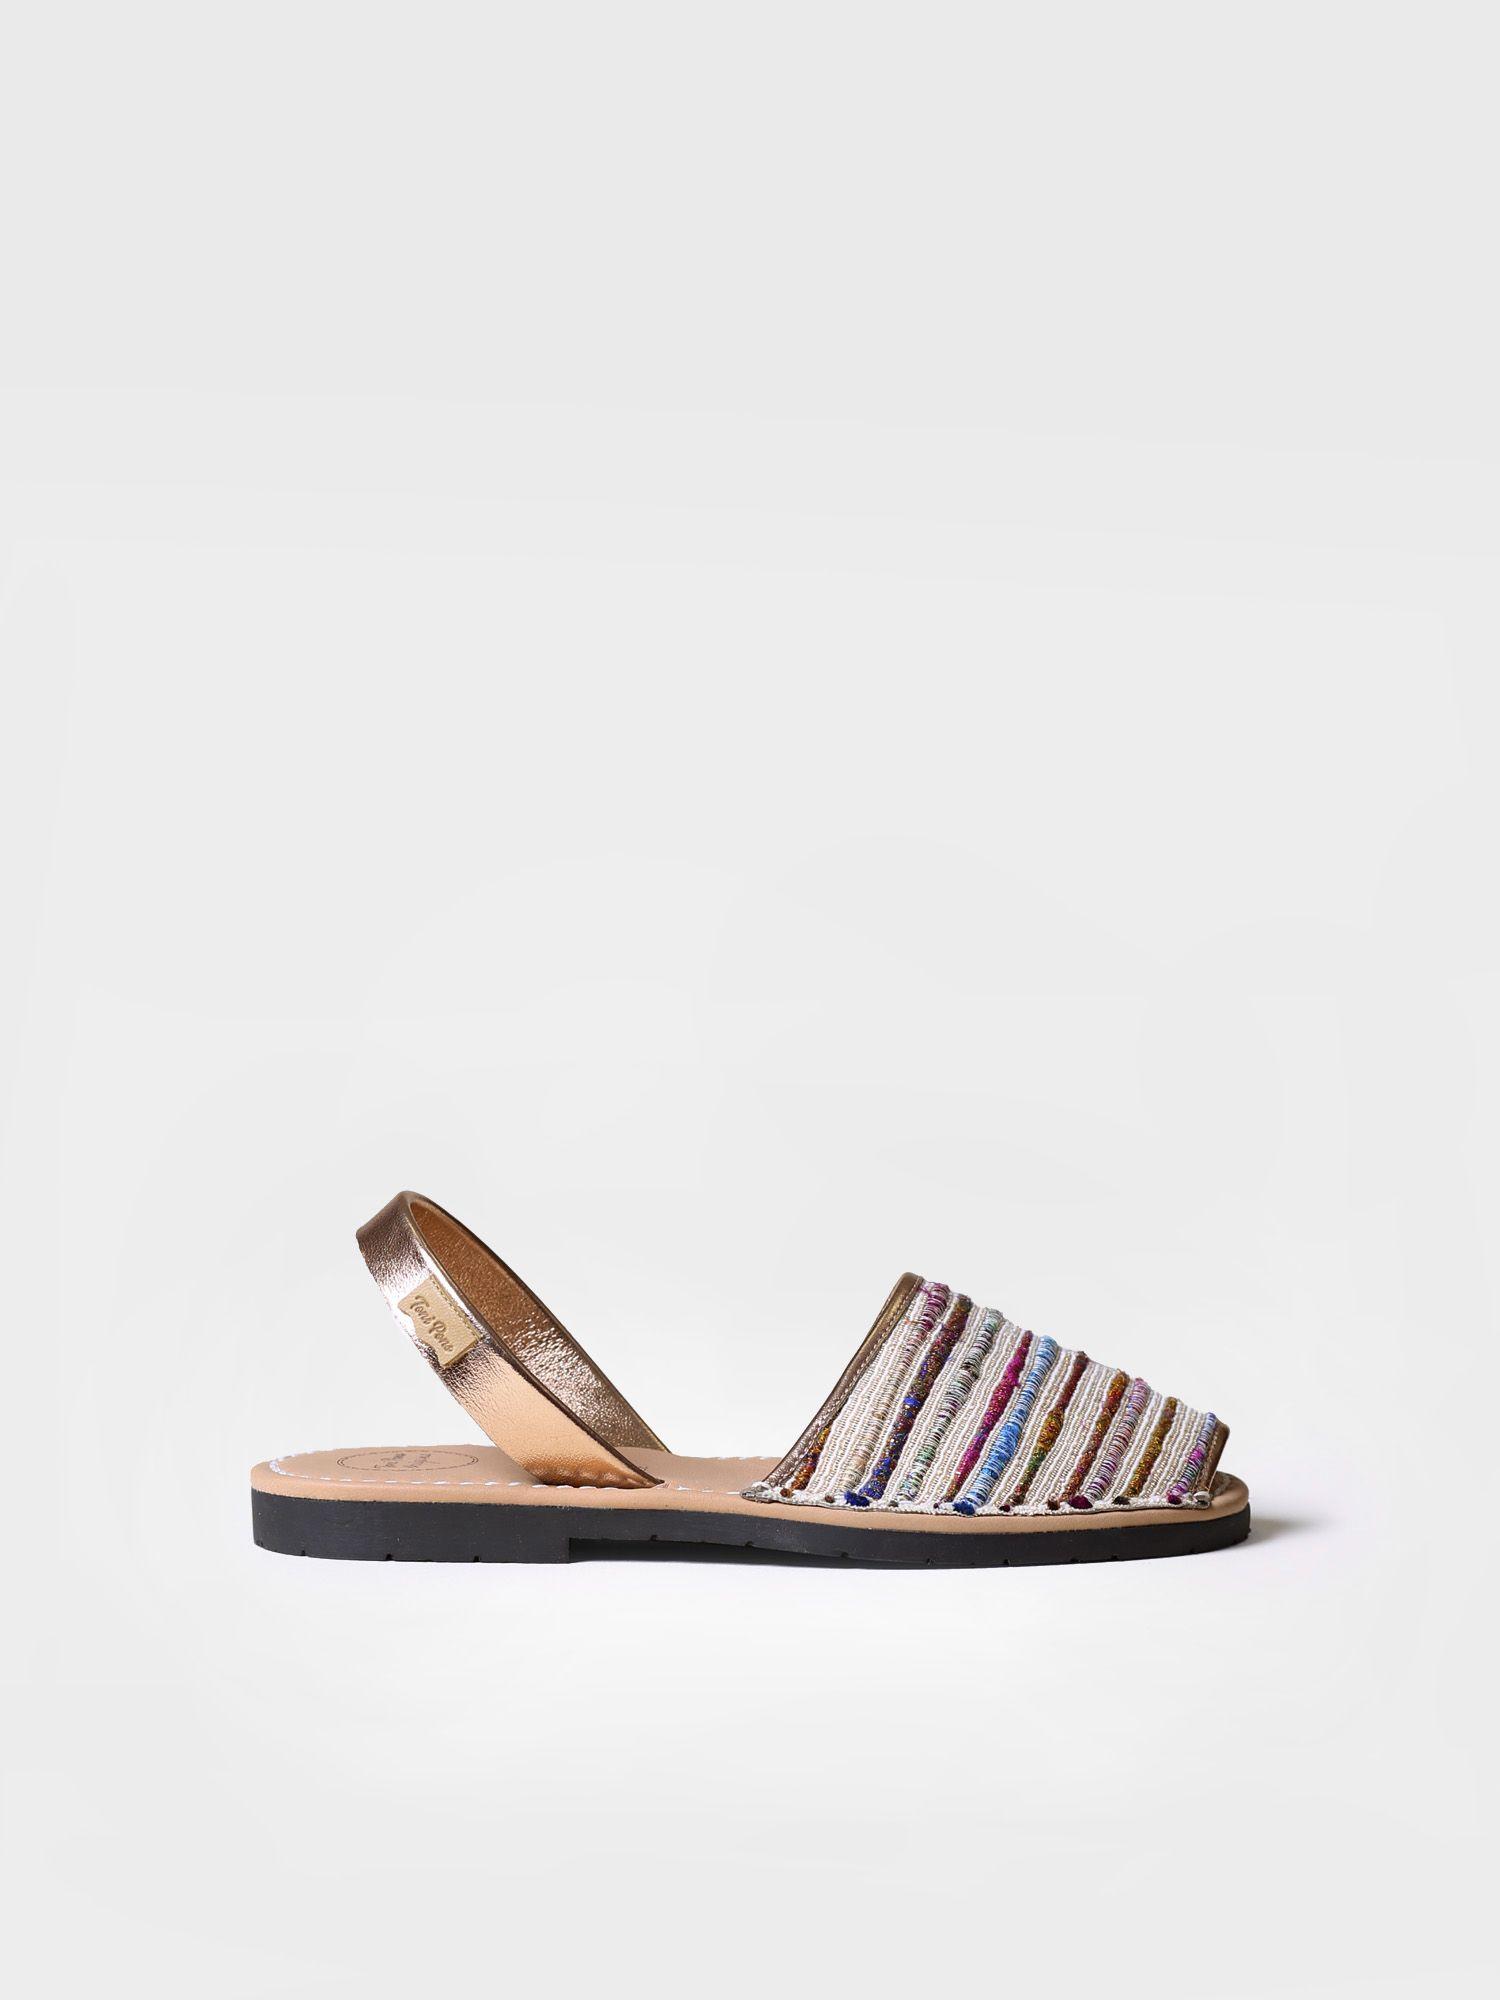 Striped avarca sandals - MAO-SN